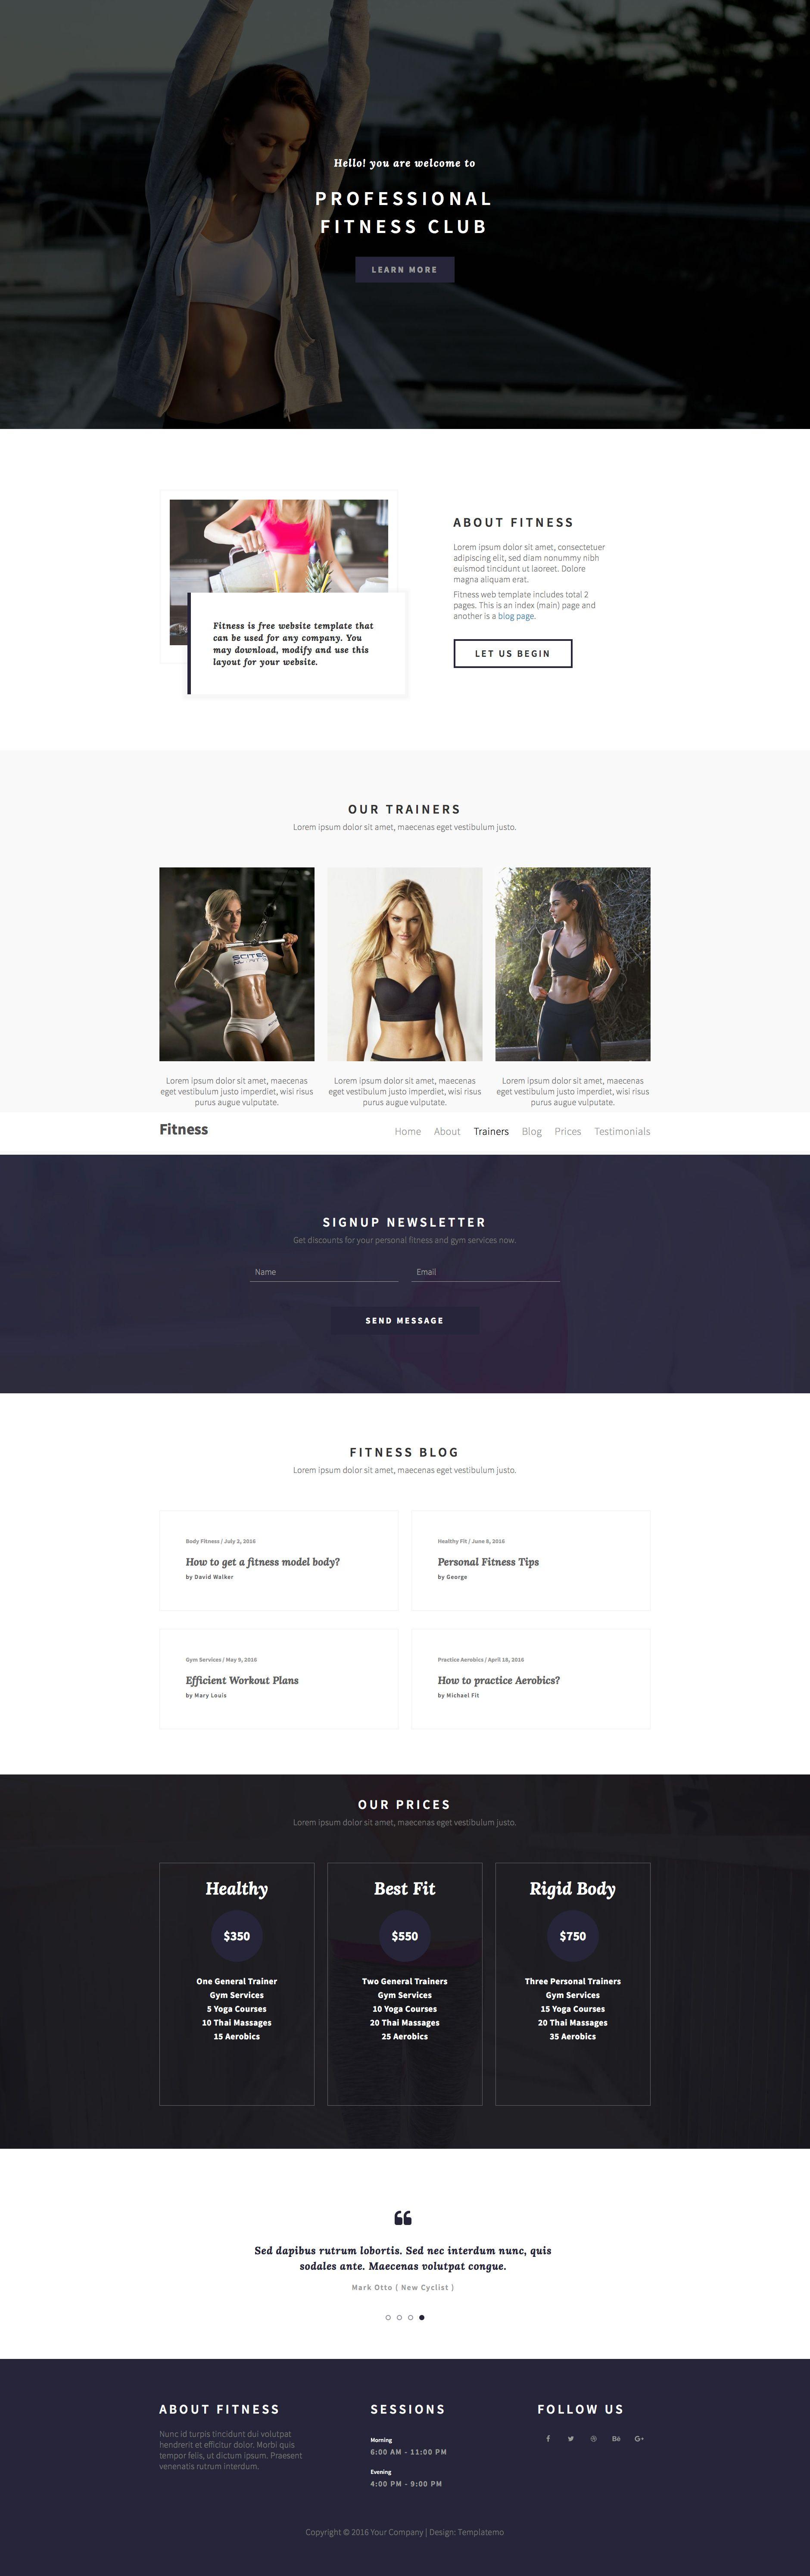 Fitness Club Website Design Wordpress Design One Page Website Cool Websites